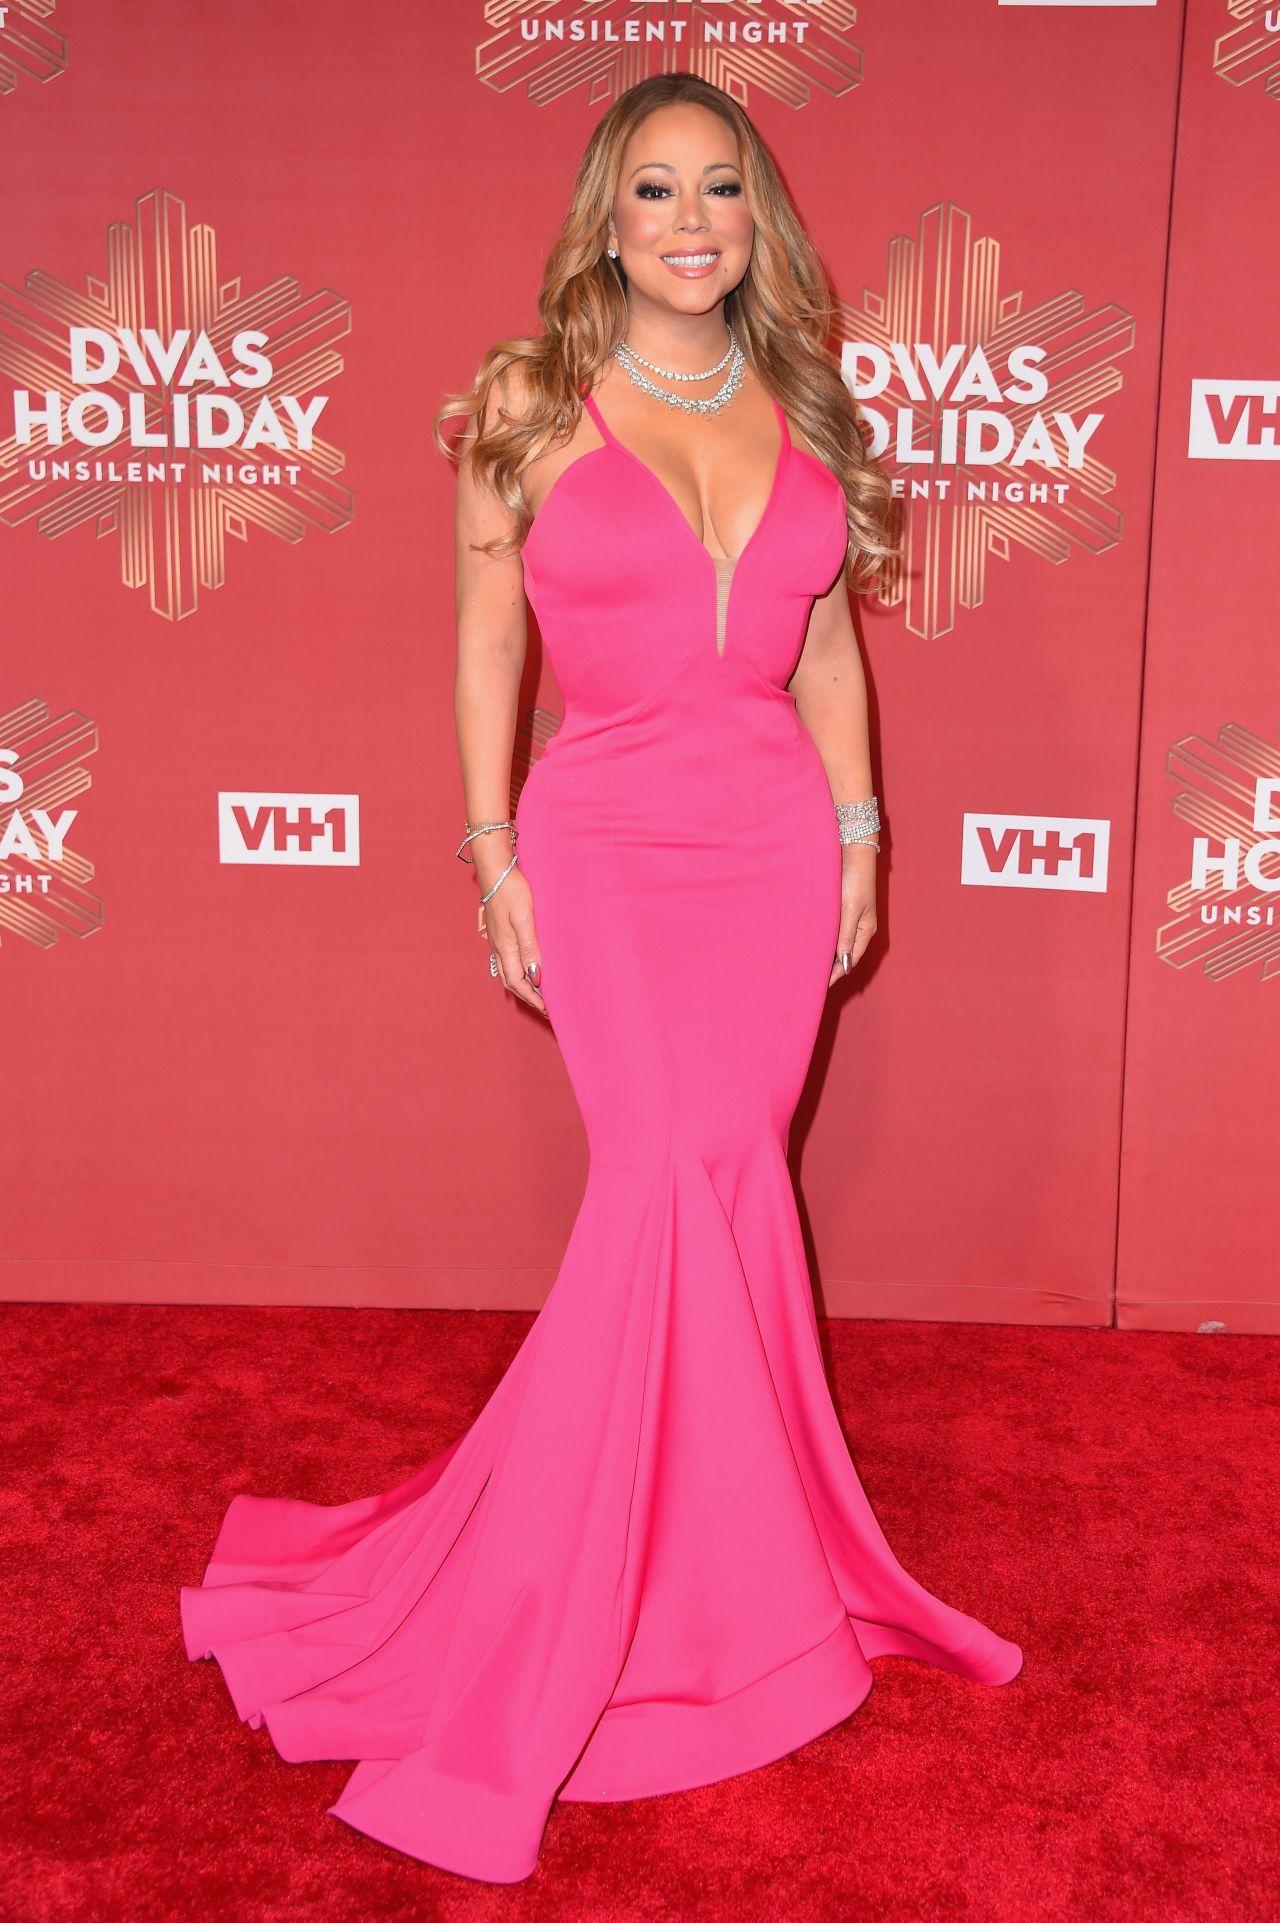 Mariah carey 2016 vh1 39 s divas holiday unsilent night in new york - Mariah carey diva ...